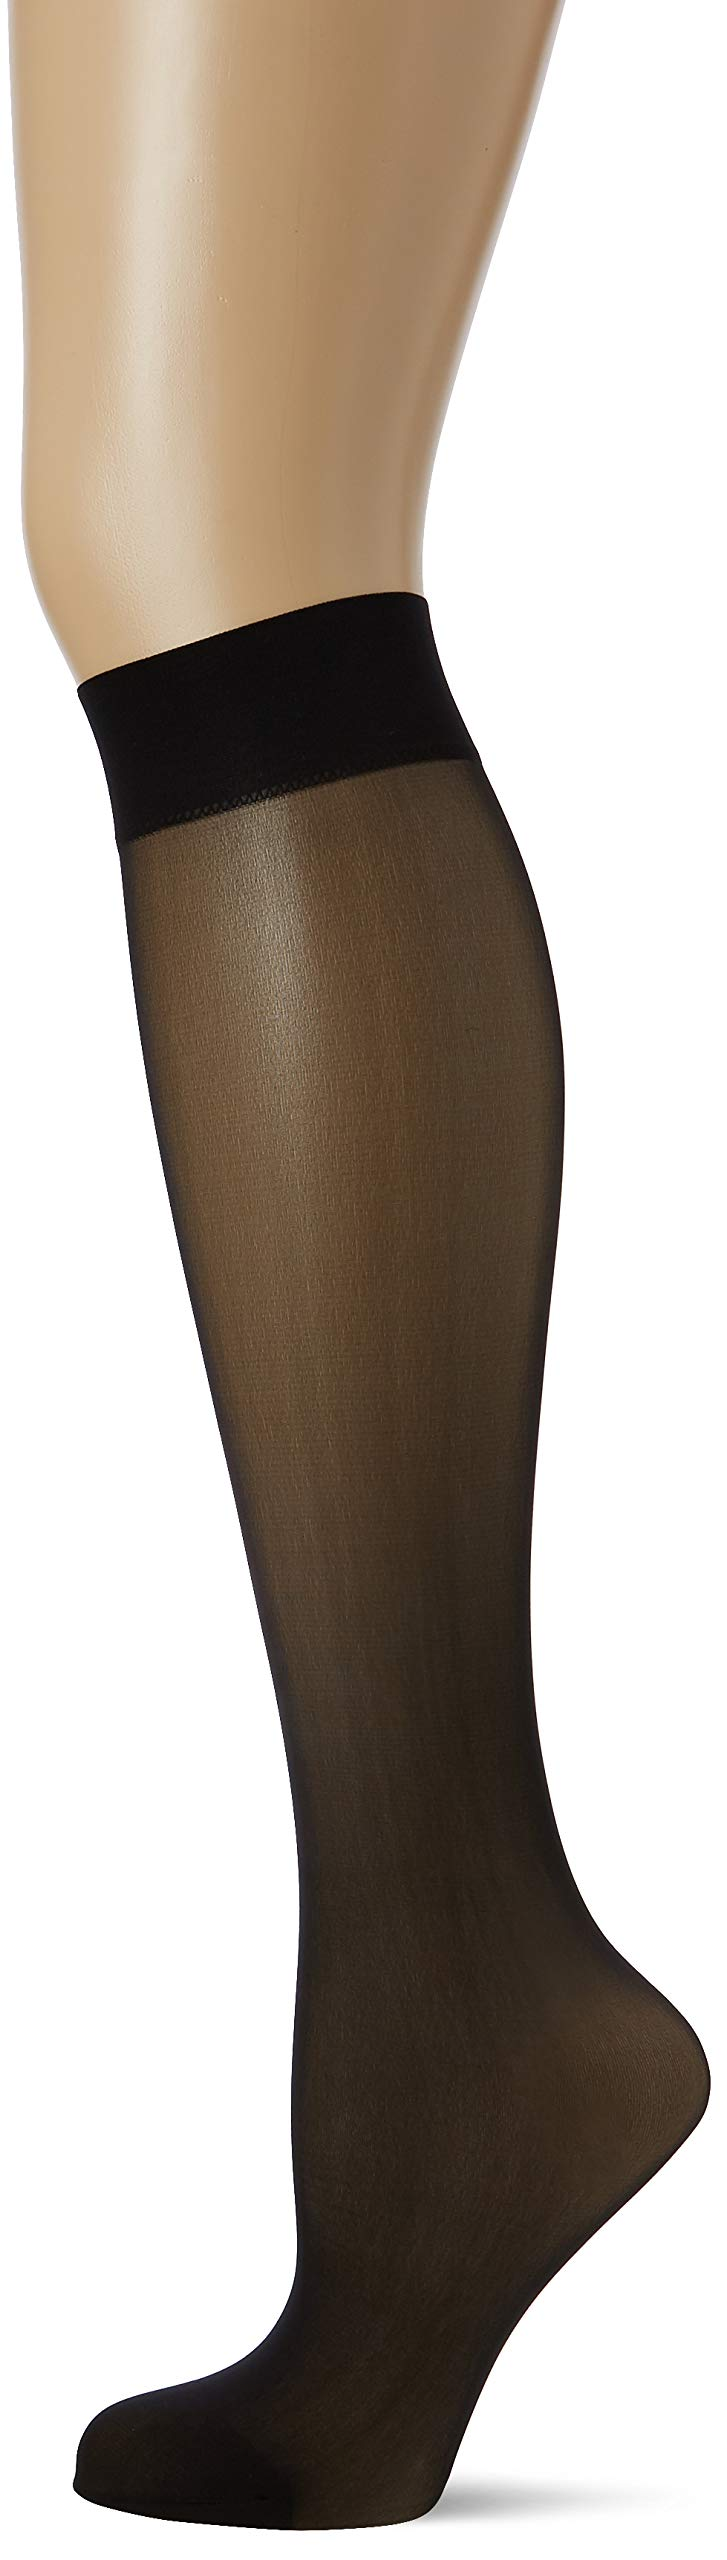 Wolford Individual 10 Knee-Highs